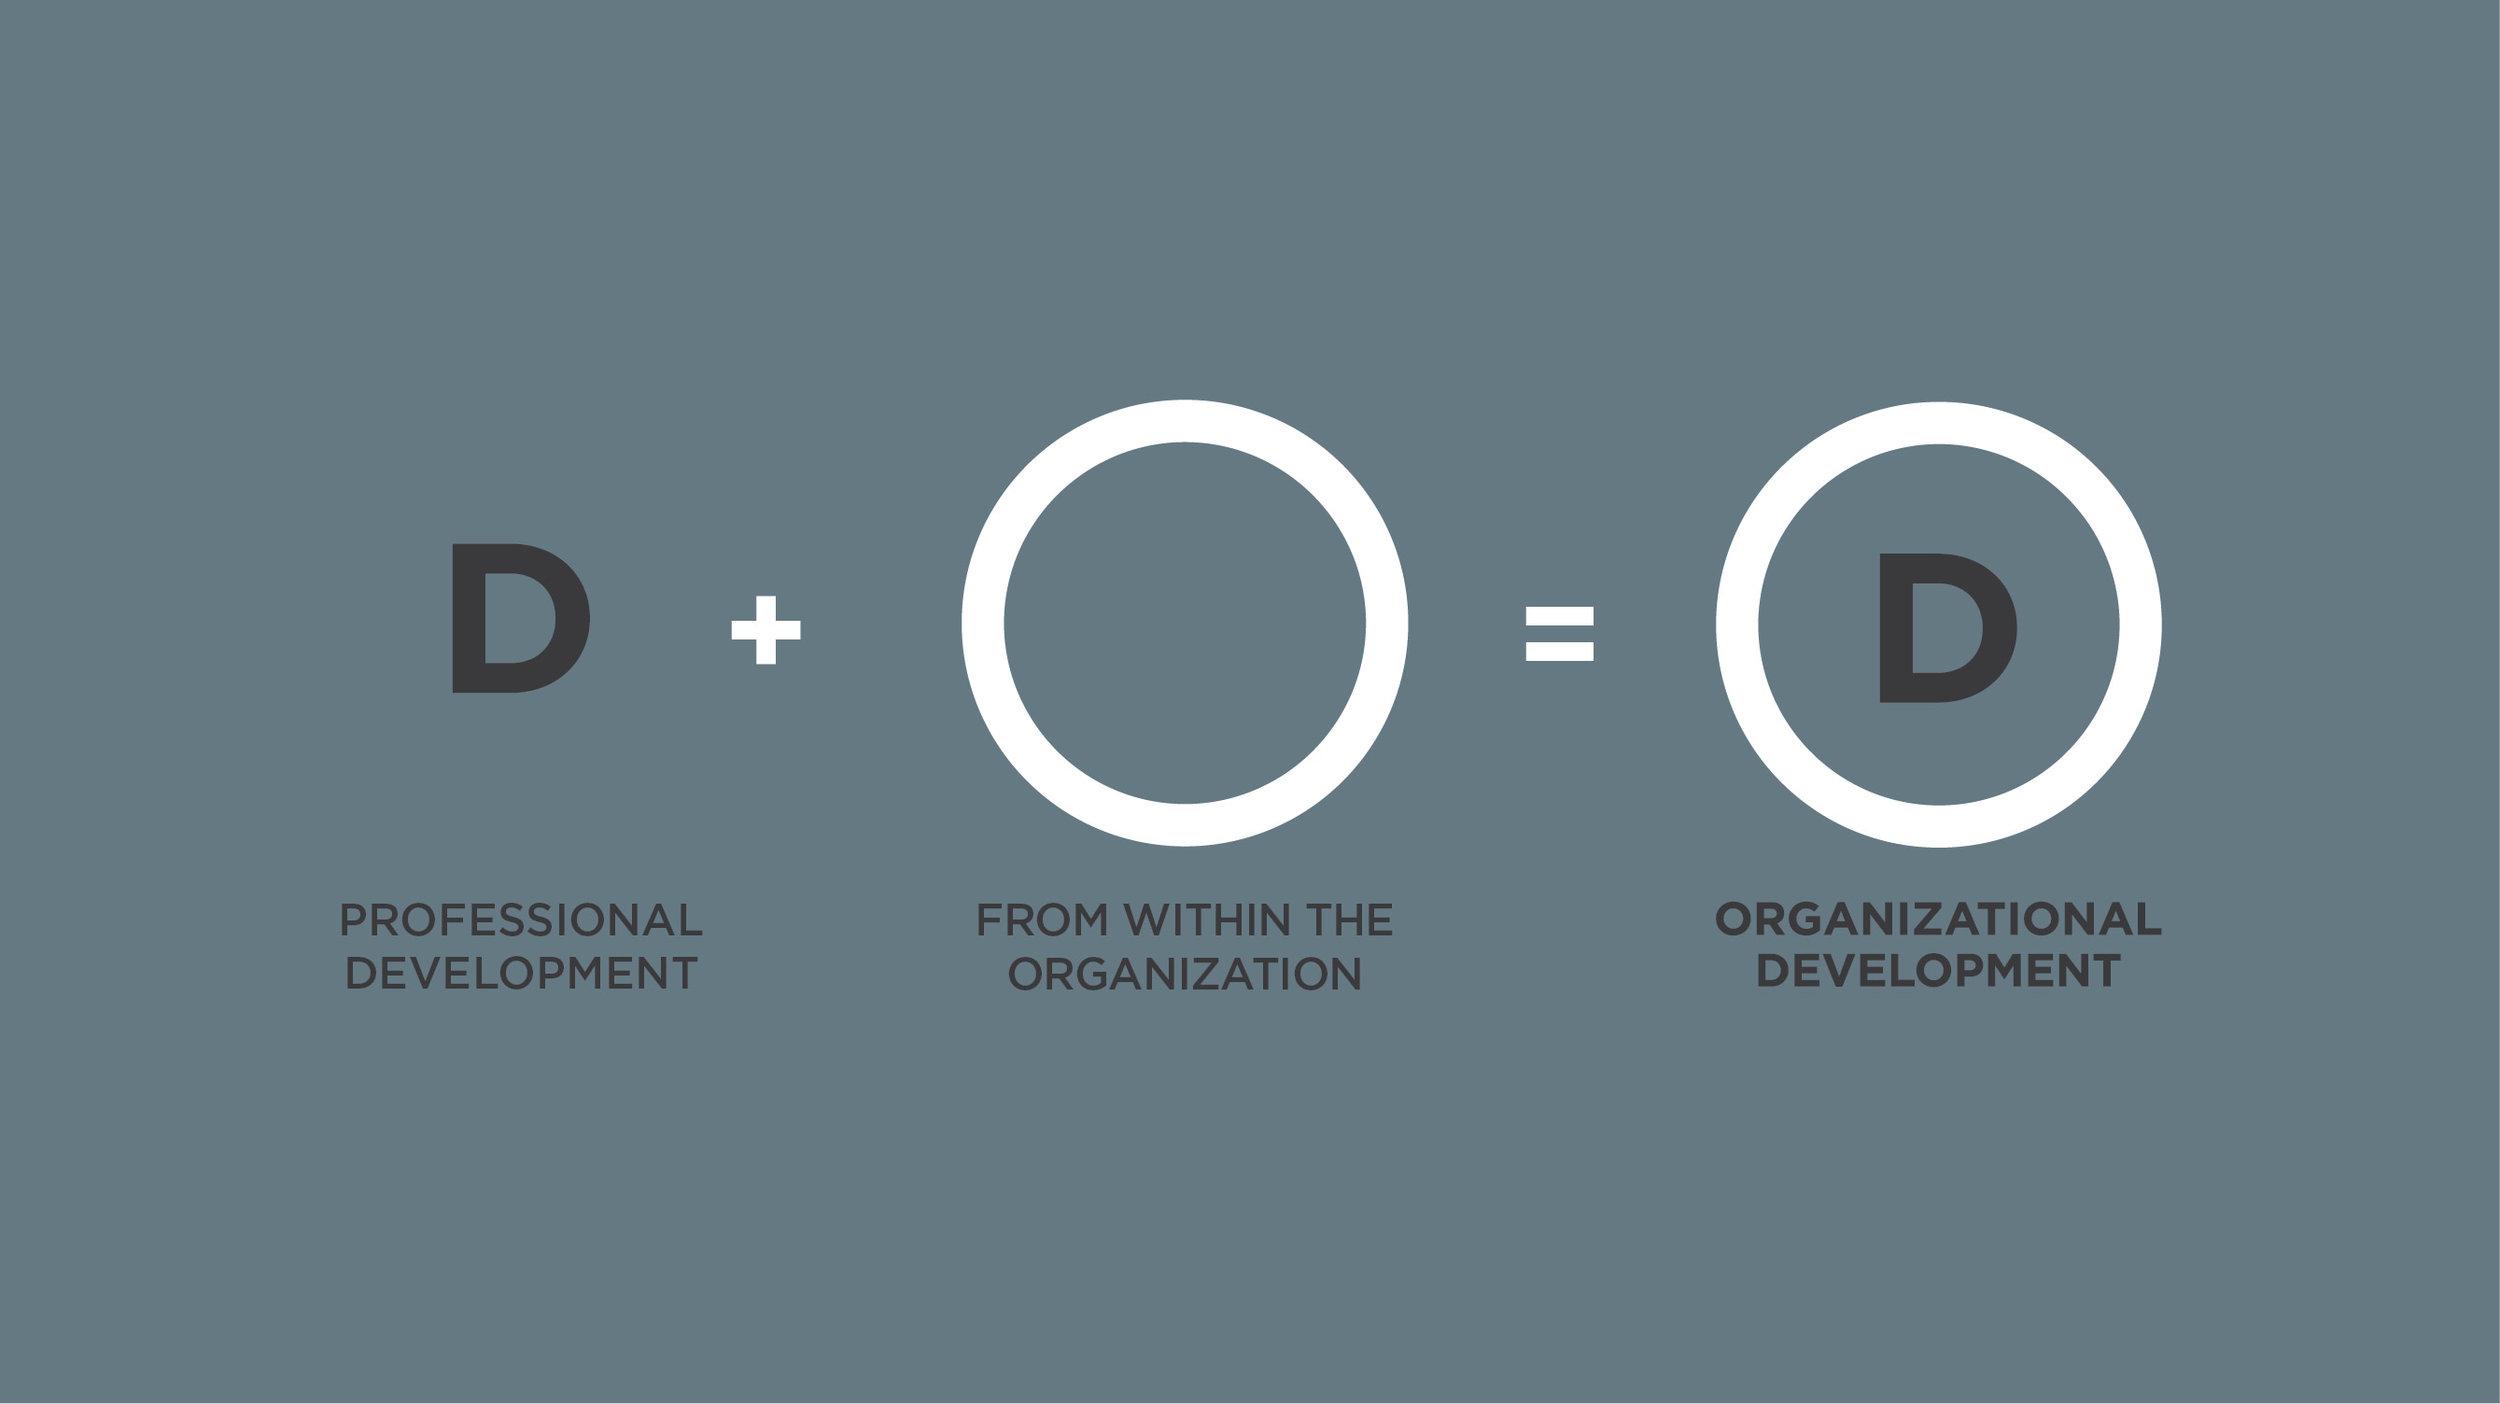 OrganizationalDevelopment-SimonLever-CPA-Business-PeteDesignCompany-Branding-BrandIdentity